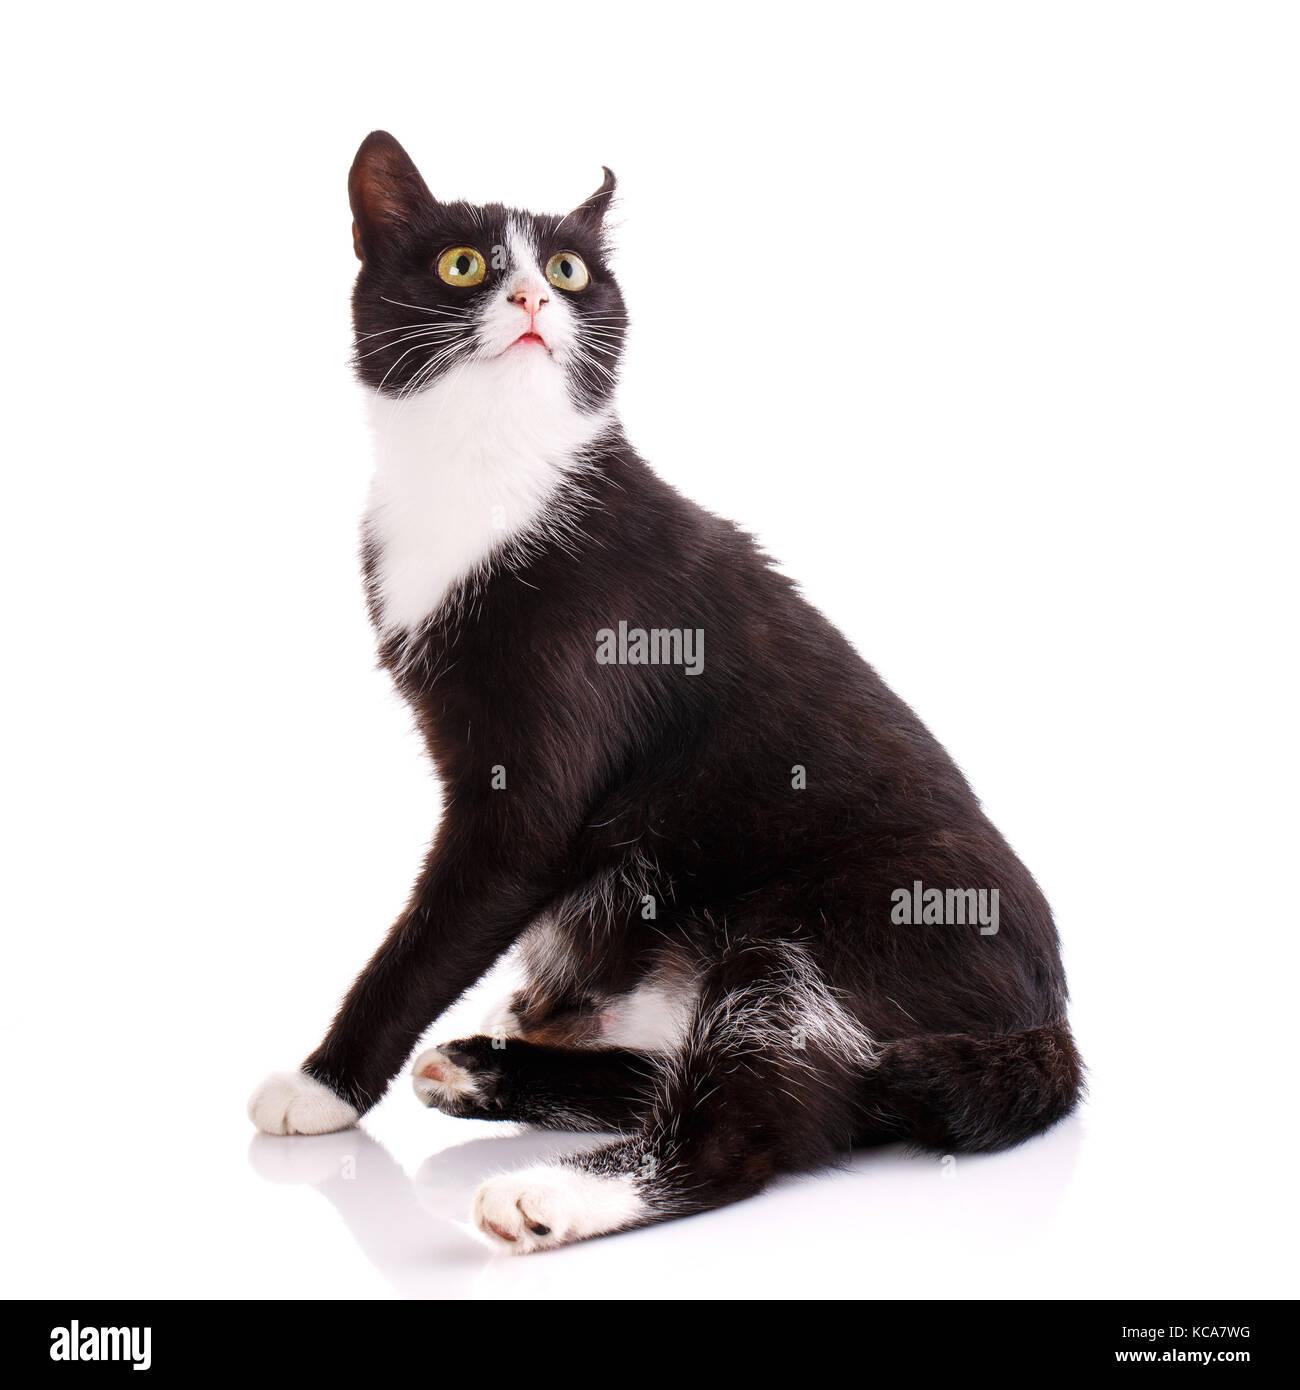 Funny Black White Domestic Shorthair Stock Photos & Funny Black ...